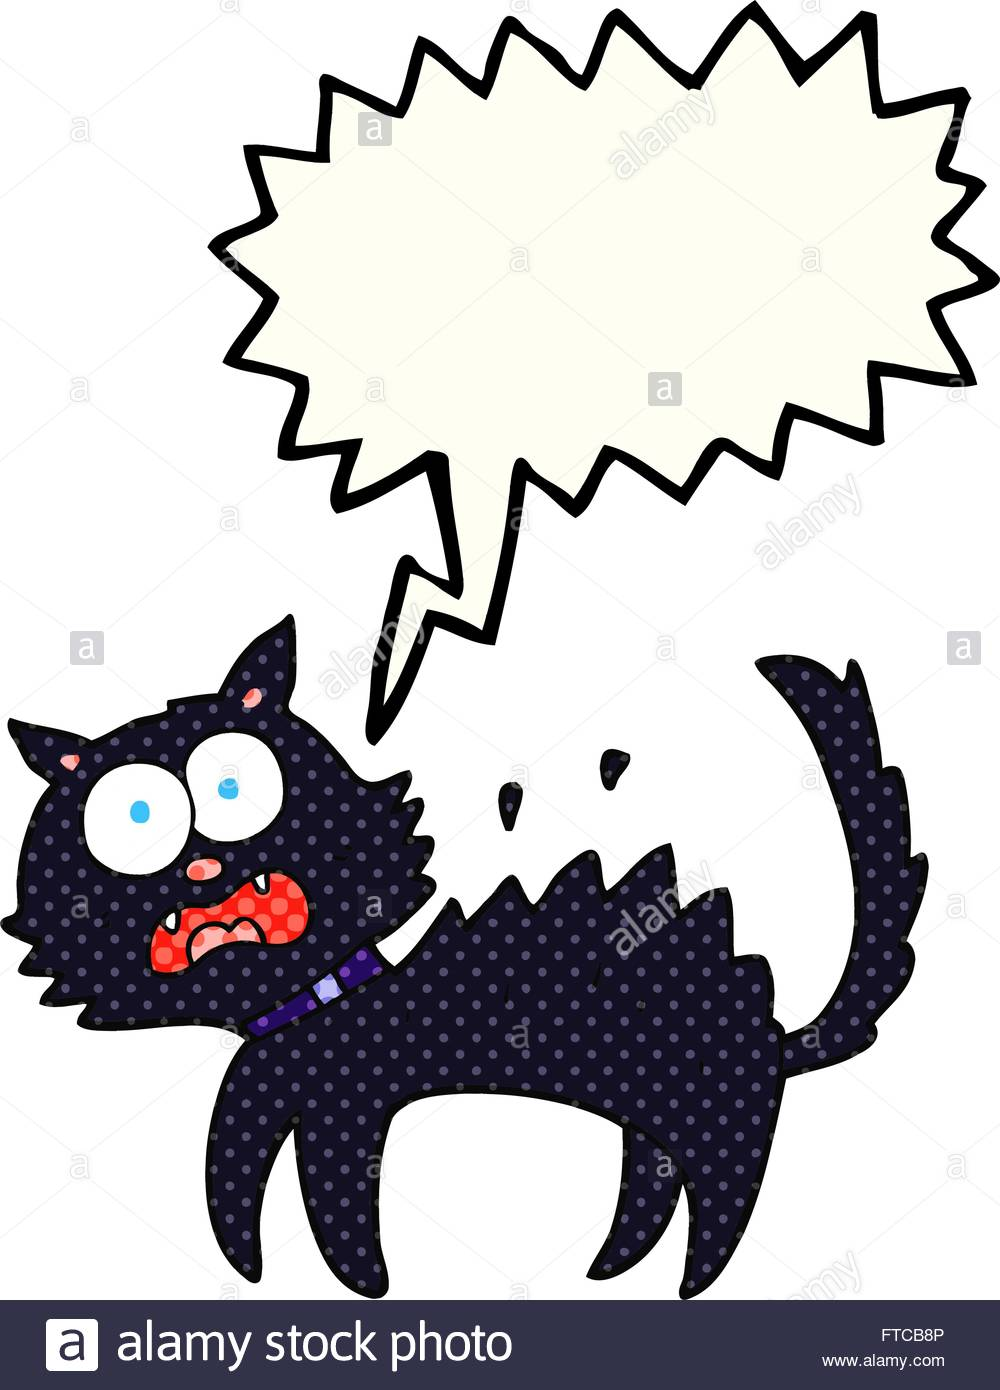 1000x1390 Drawn Black Cat Scared